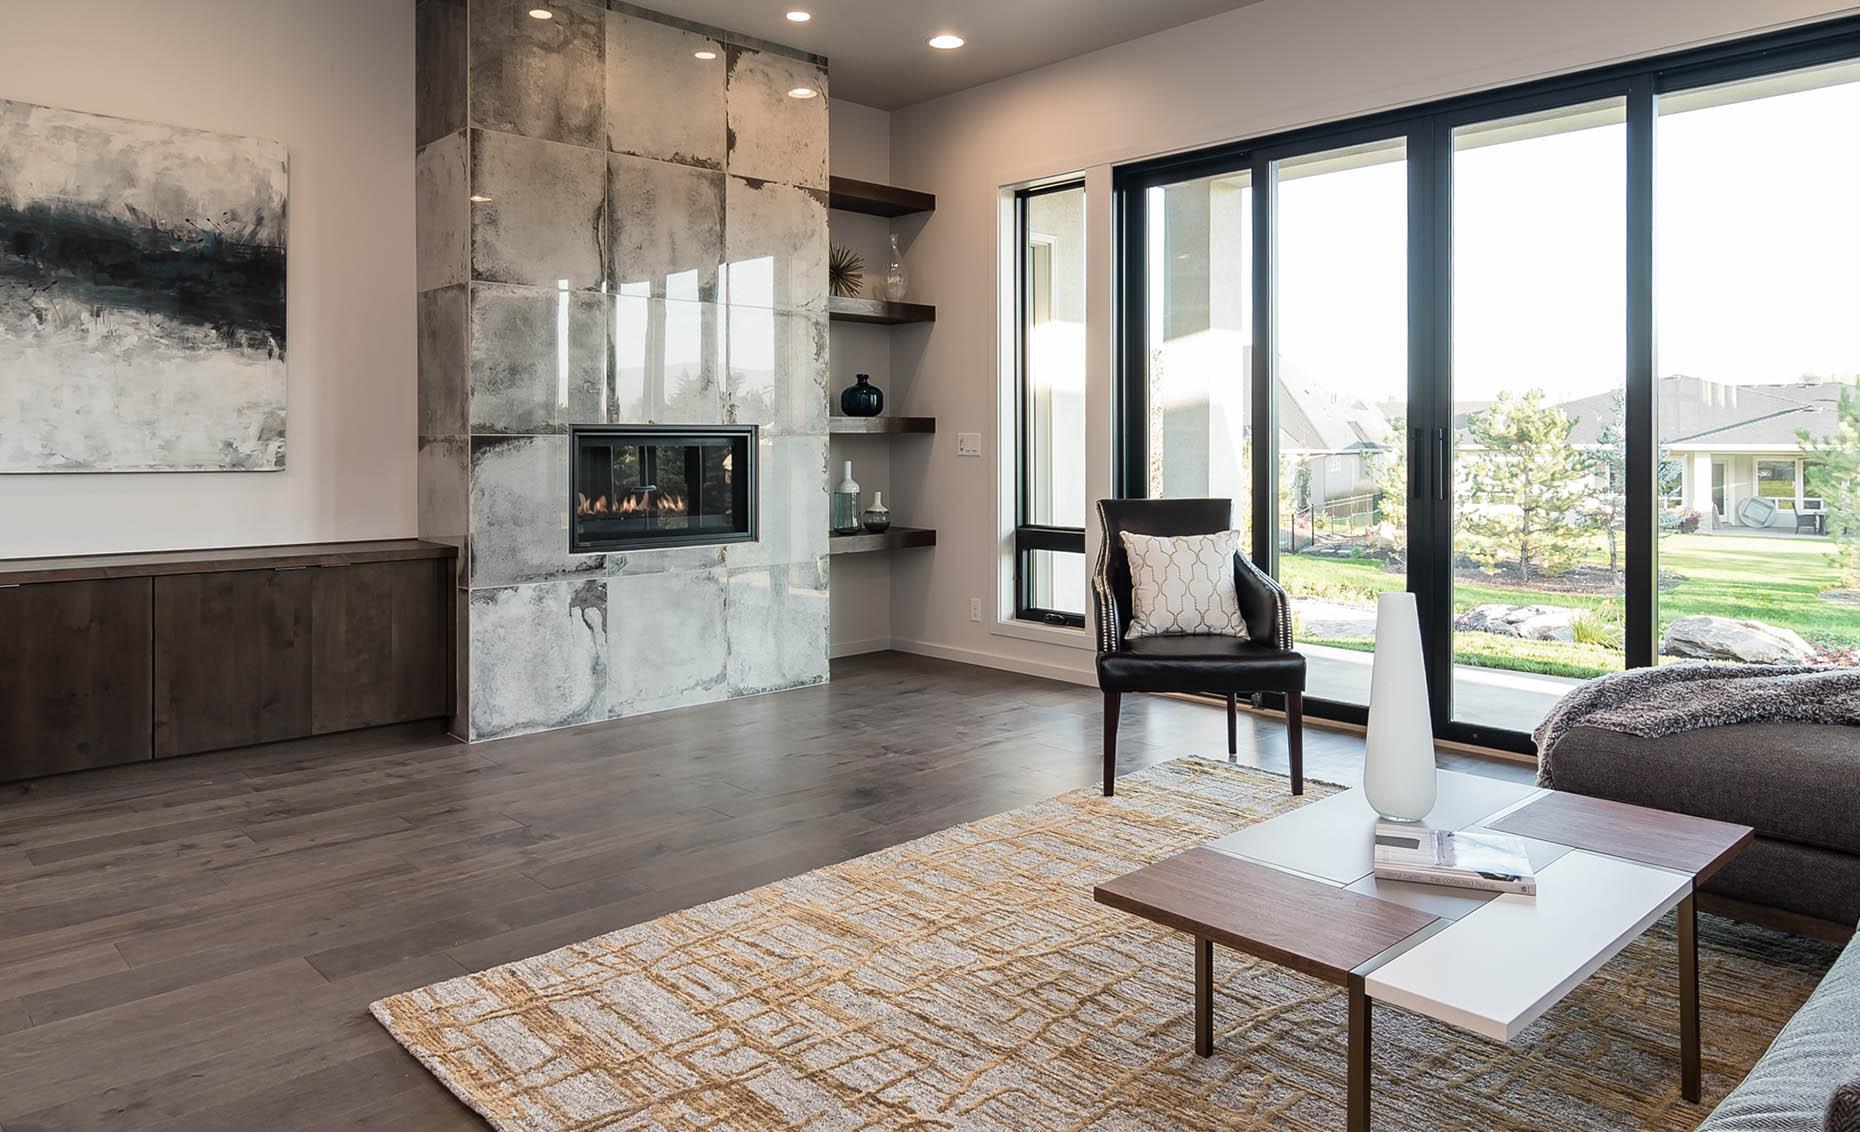 The Moderno House Living Room